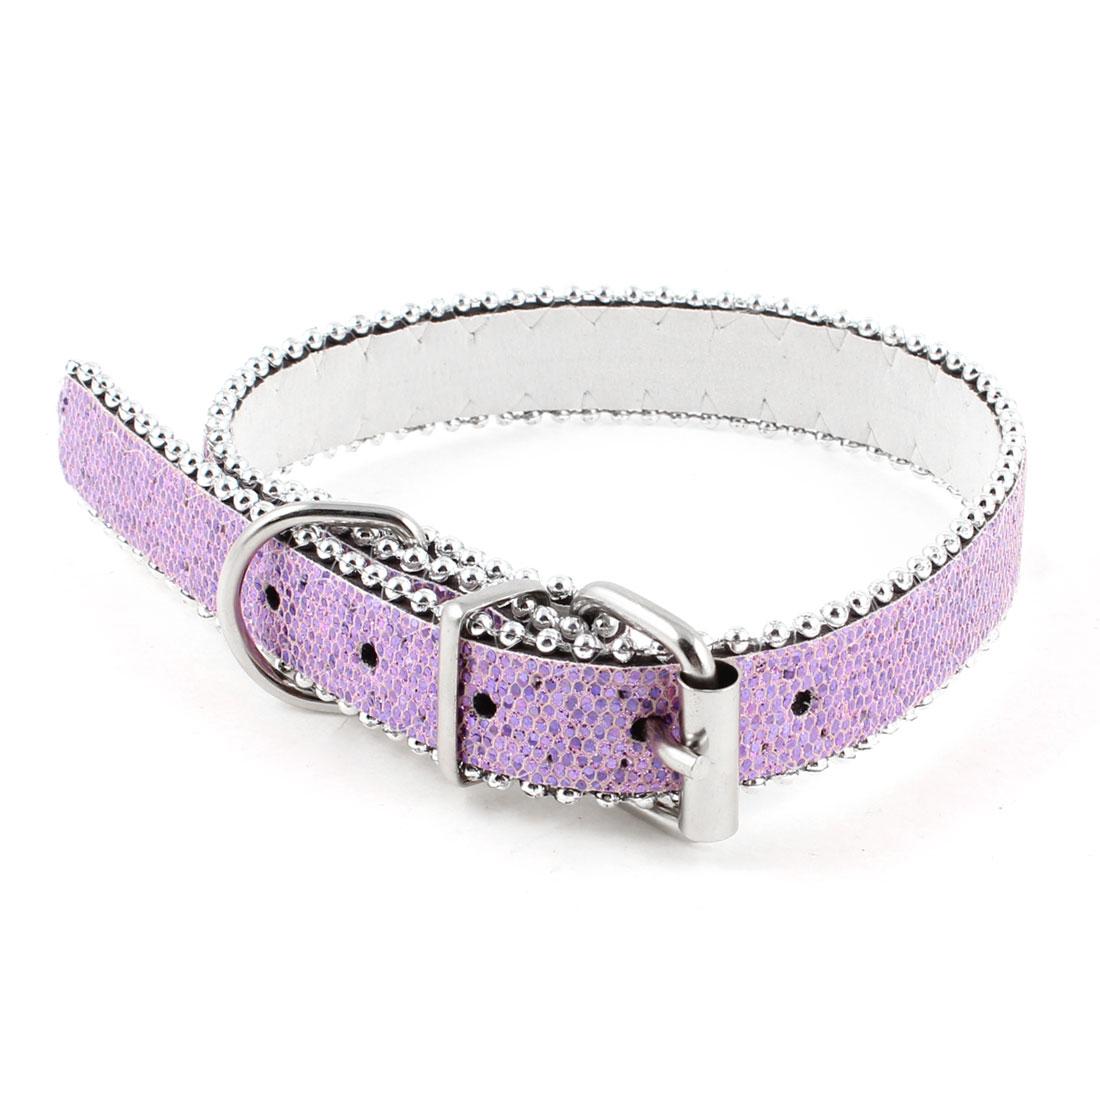 Faux Leather Adjustable Glitter Powder Plastic Bead Detail Dog Pet Collar Light Purple